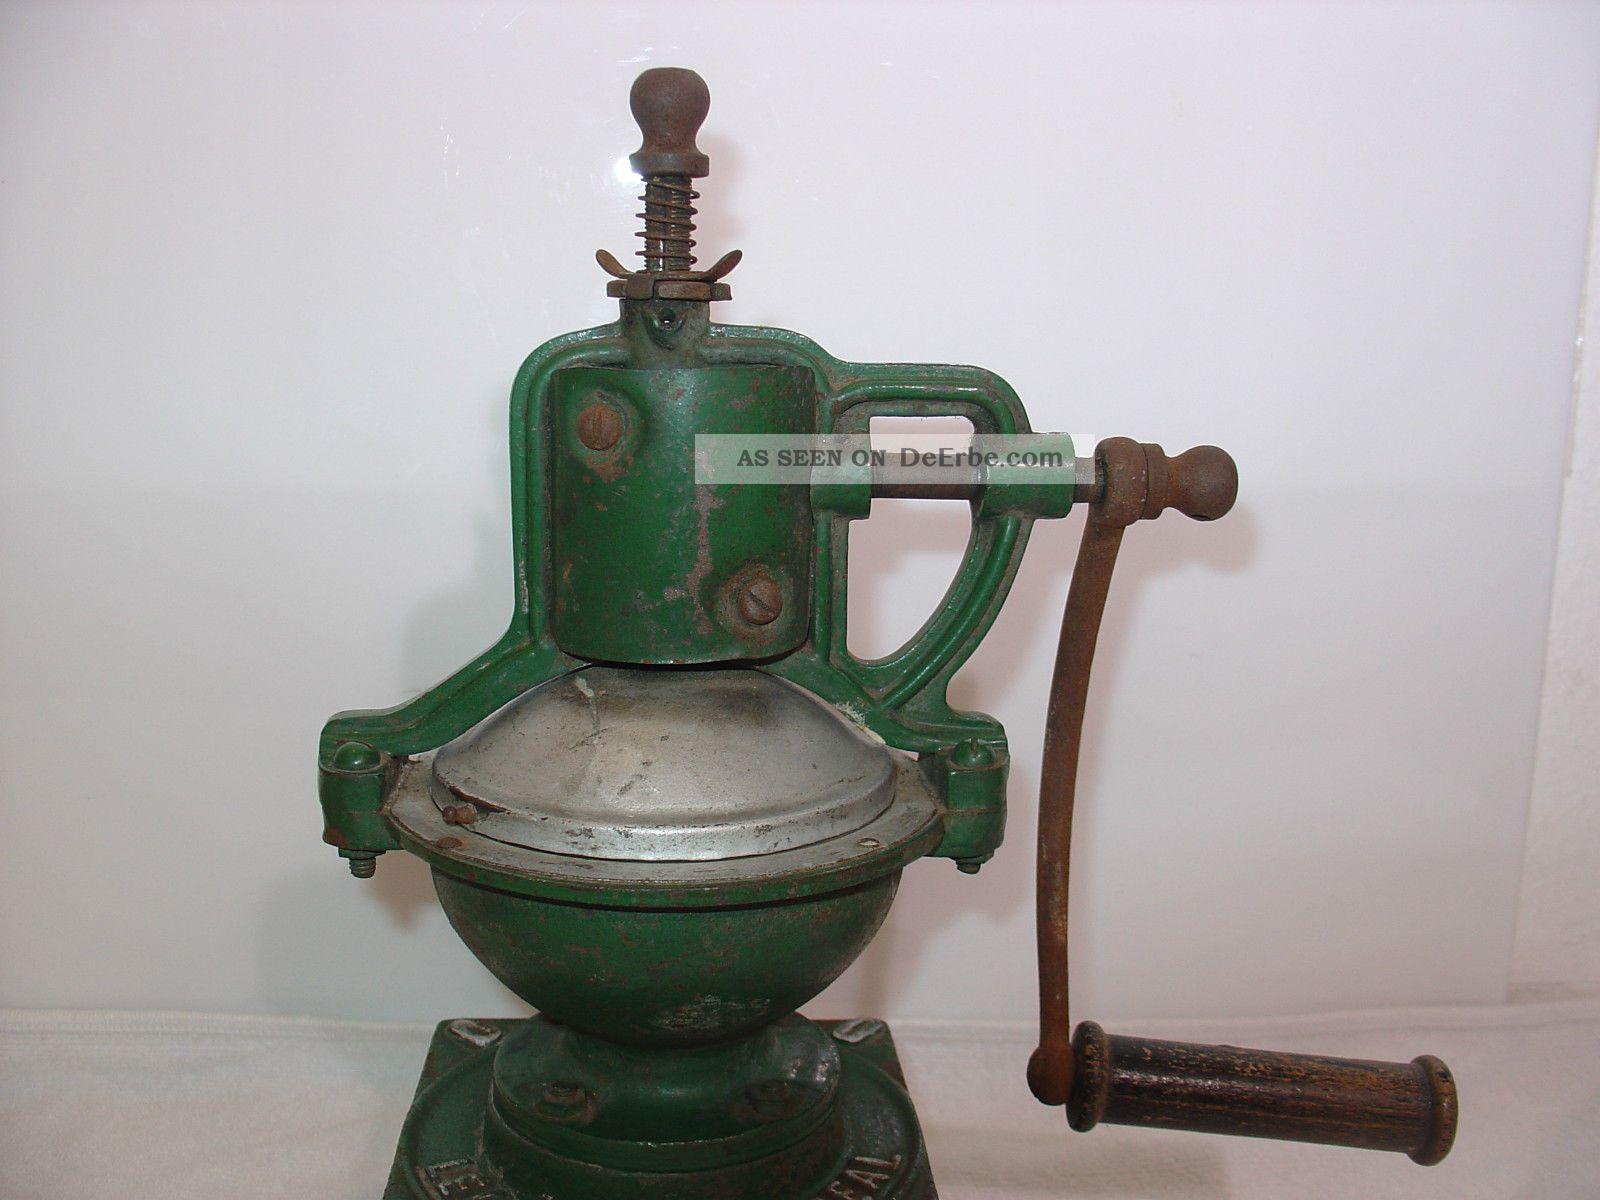 Leinbrock s kaffeem hle gr 0 rar moulin caf de comptoir coffee grinder - Moulin a cafe de comptoir ...